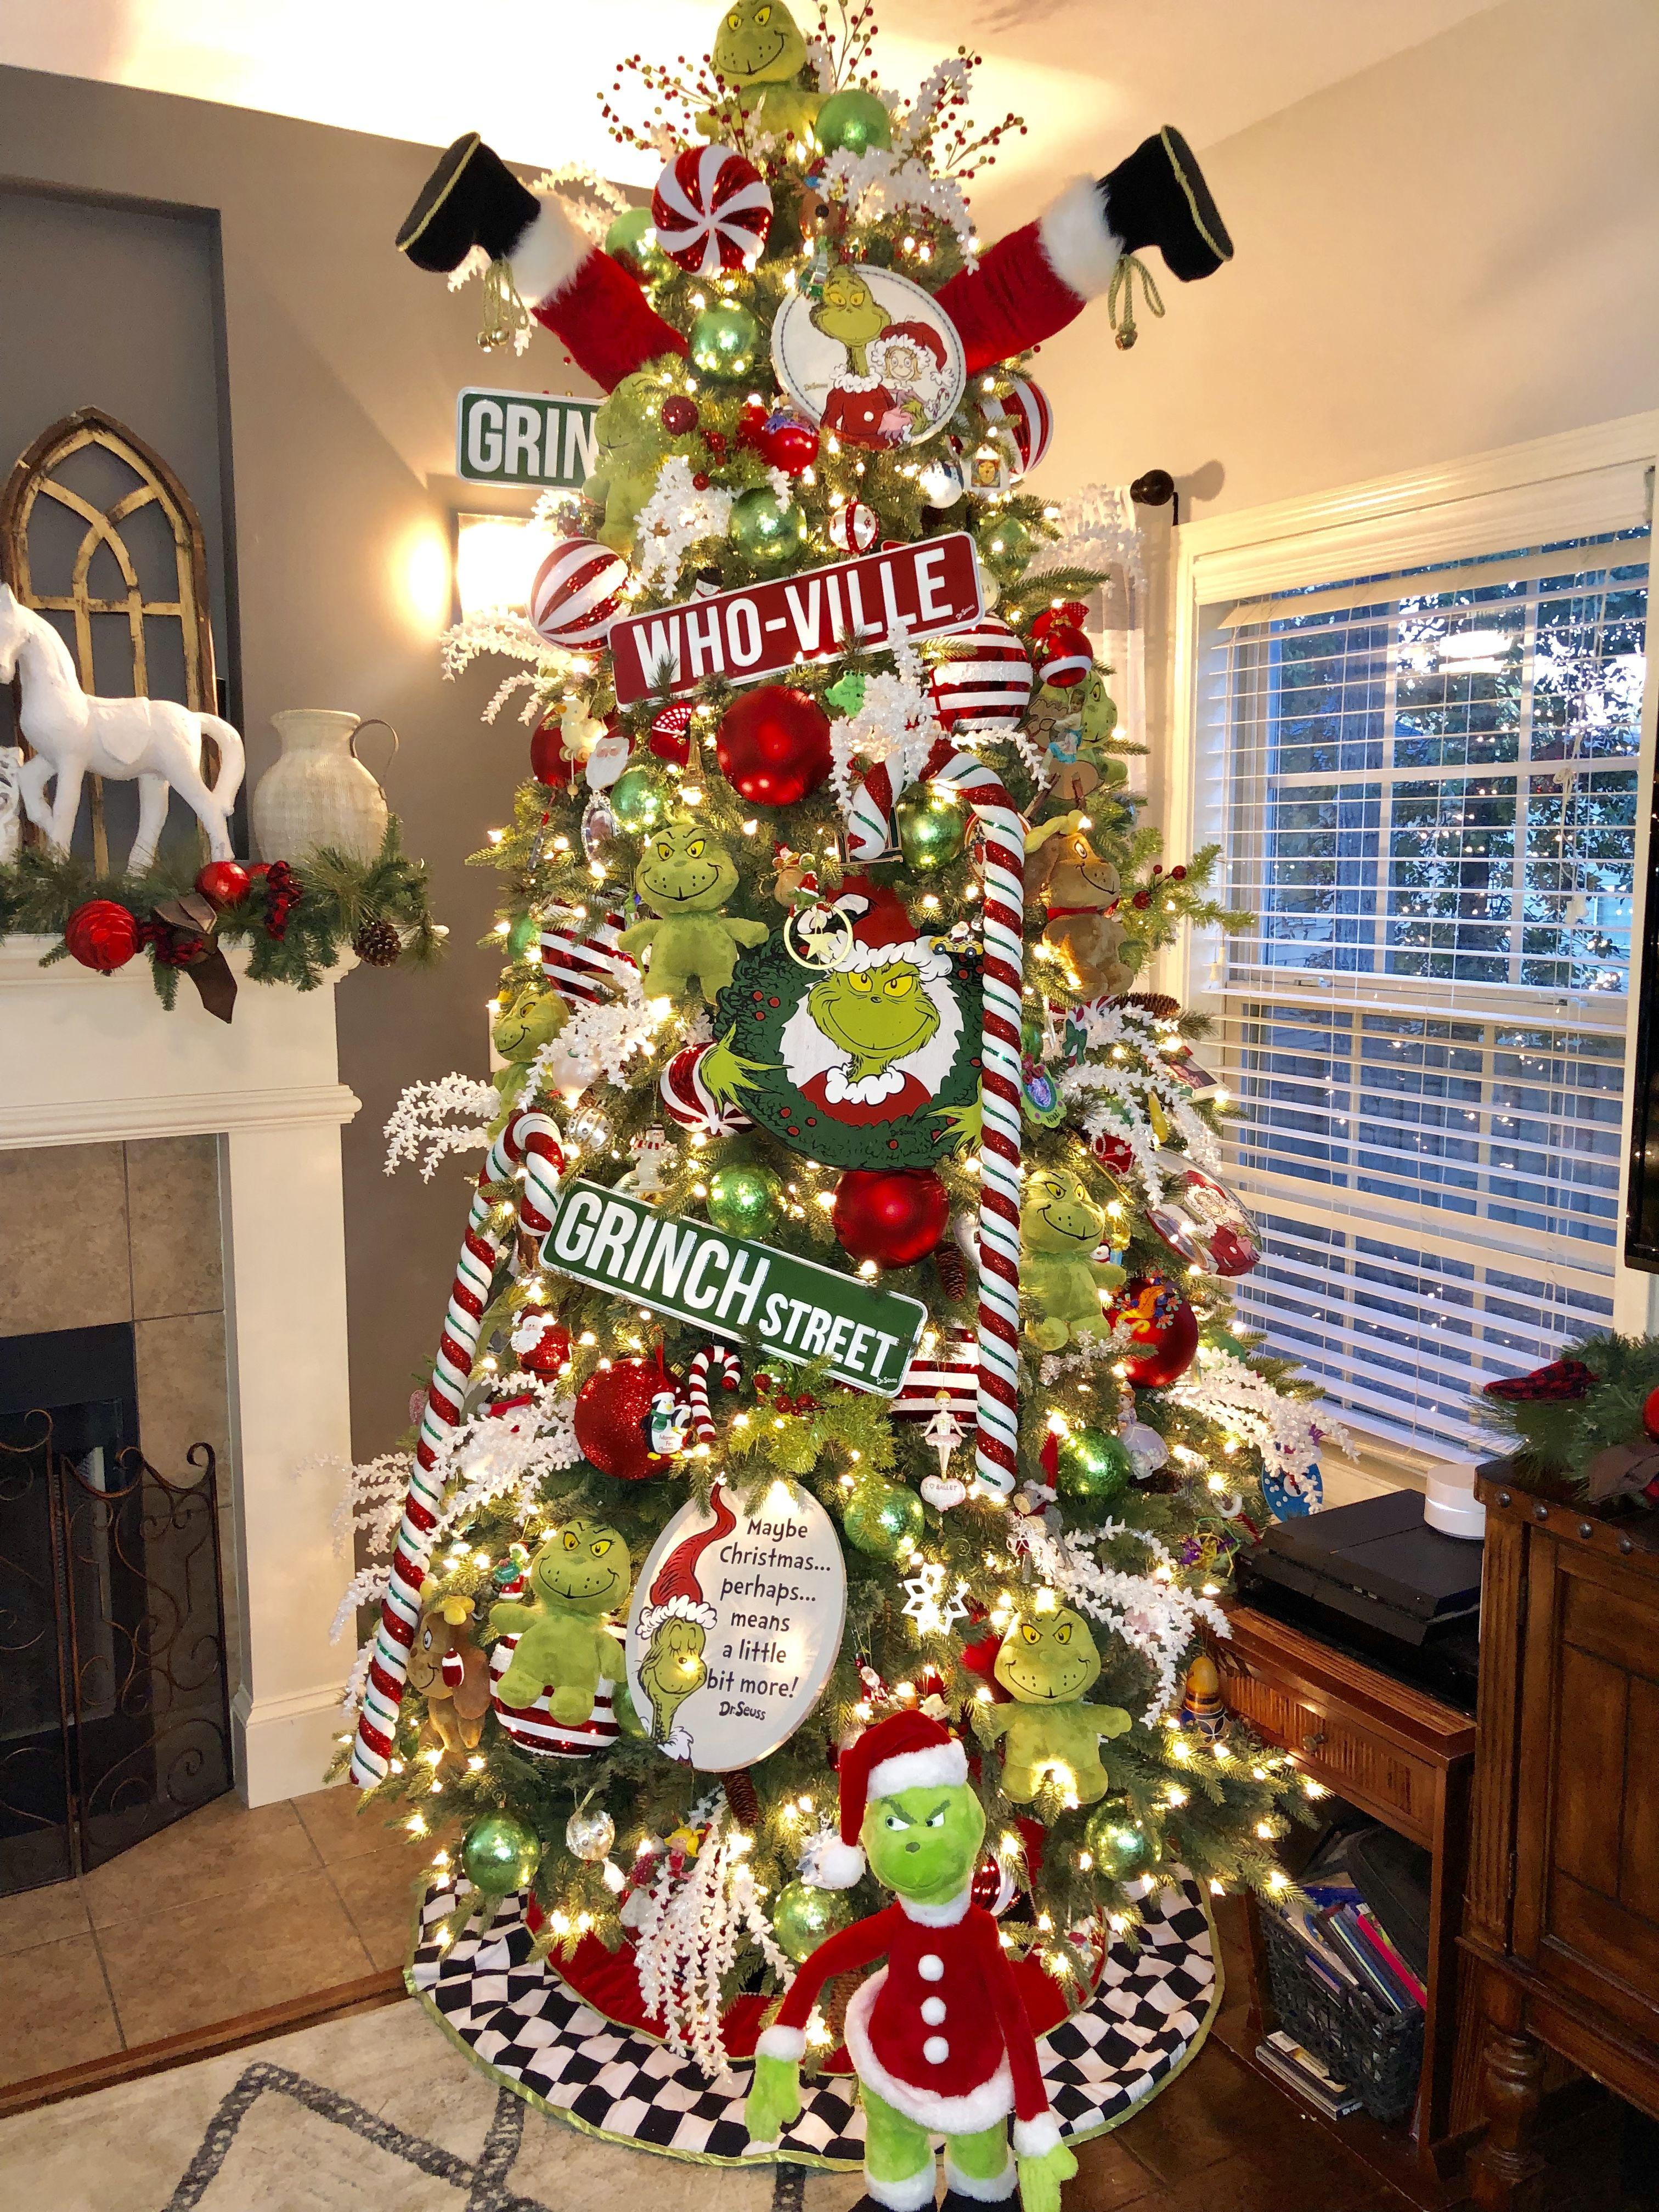 Grinch Christmas Tree Grinch Christmas Tree Christmas Tree Inspiration Grinch Christmas Decorations